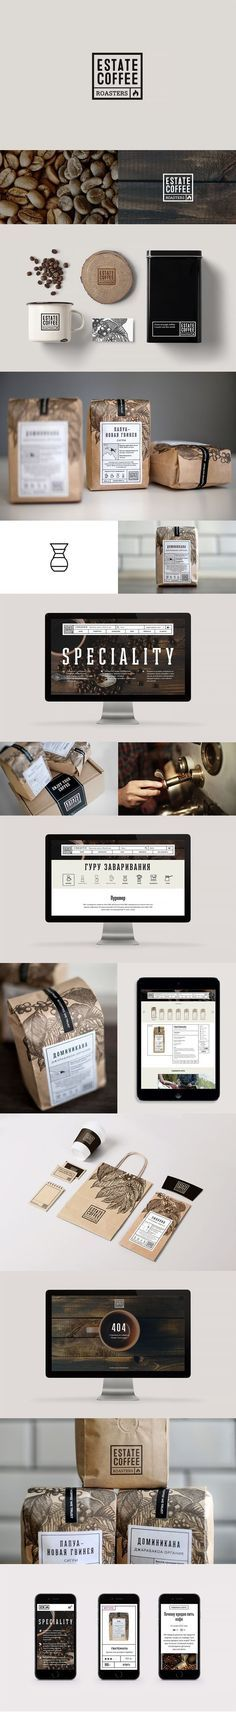 Estate Coffee Roasters on Behance | Fivestar Branding – Design and Branding Agency & Inspiration Gallery